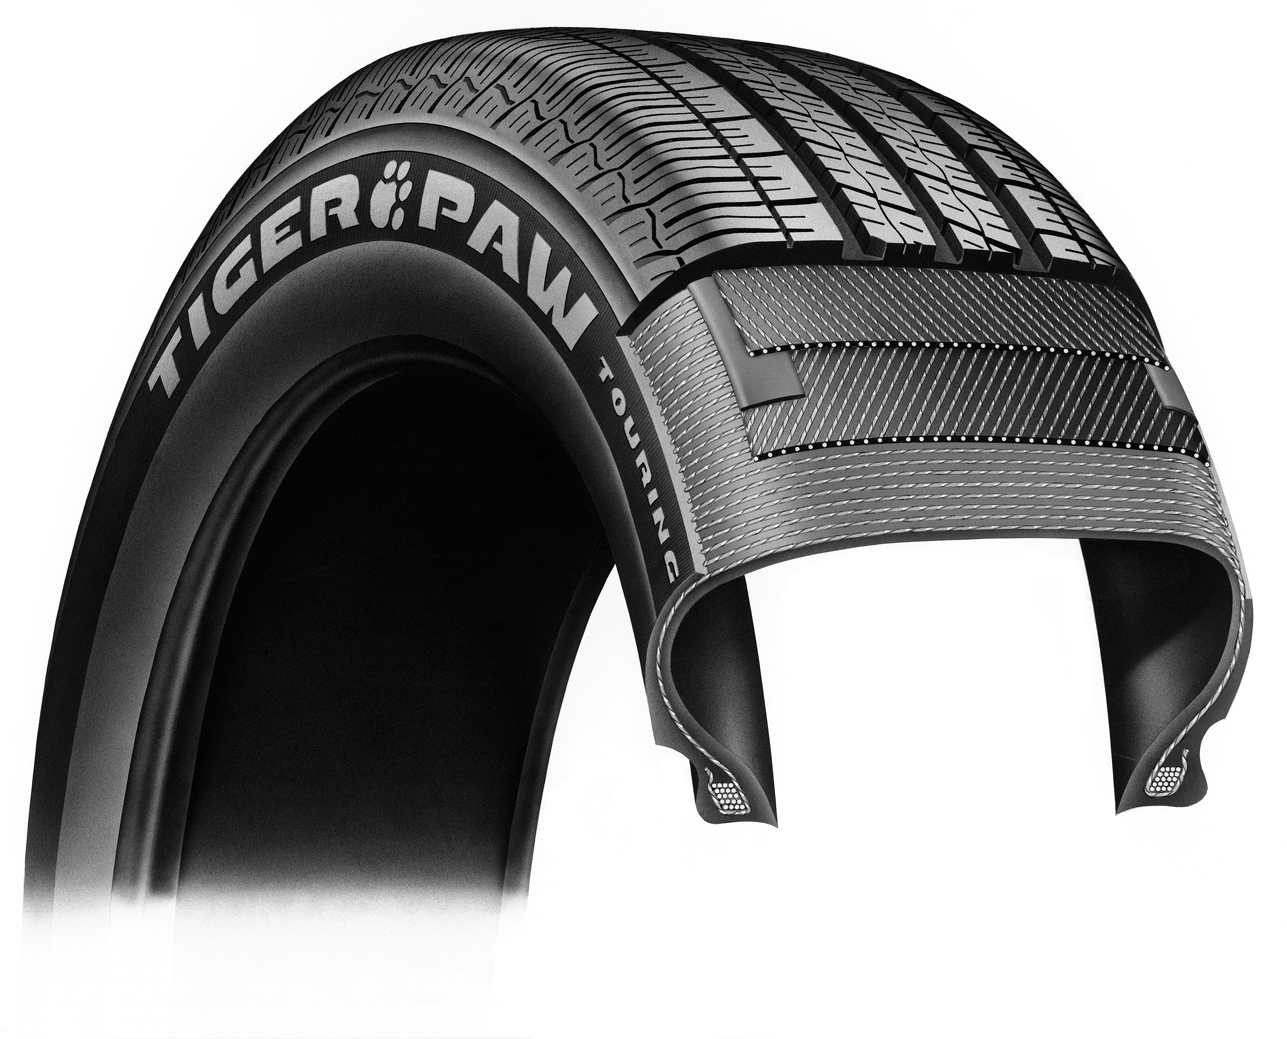 tiger-paw-touring-tire-cutaway